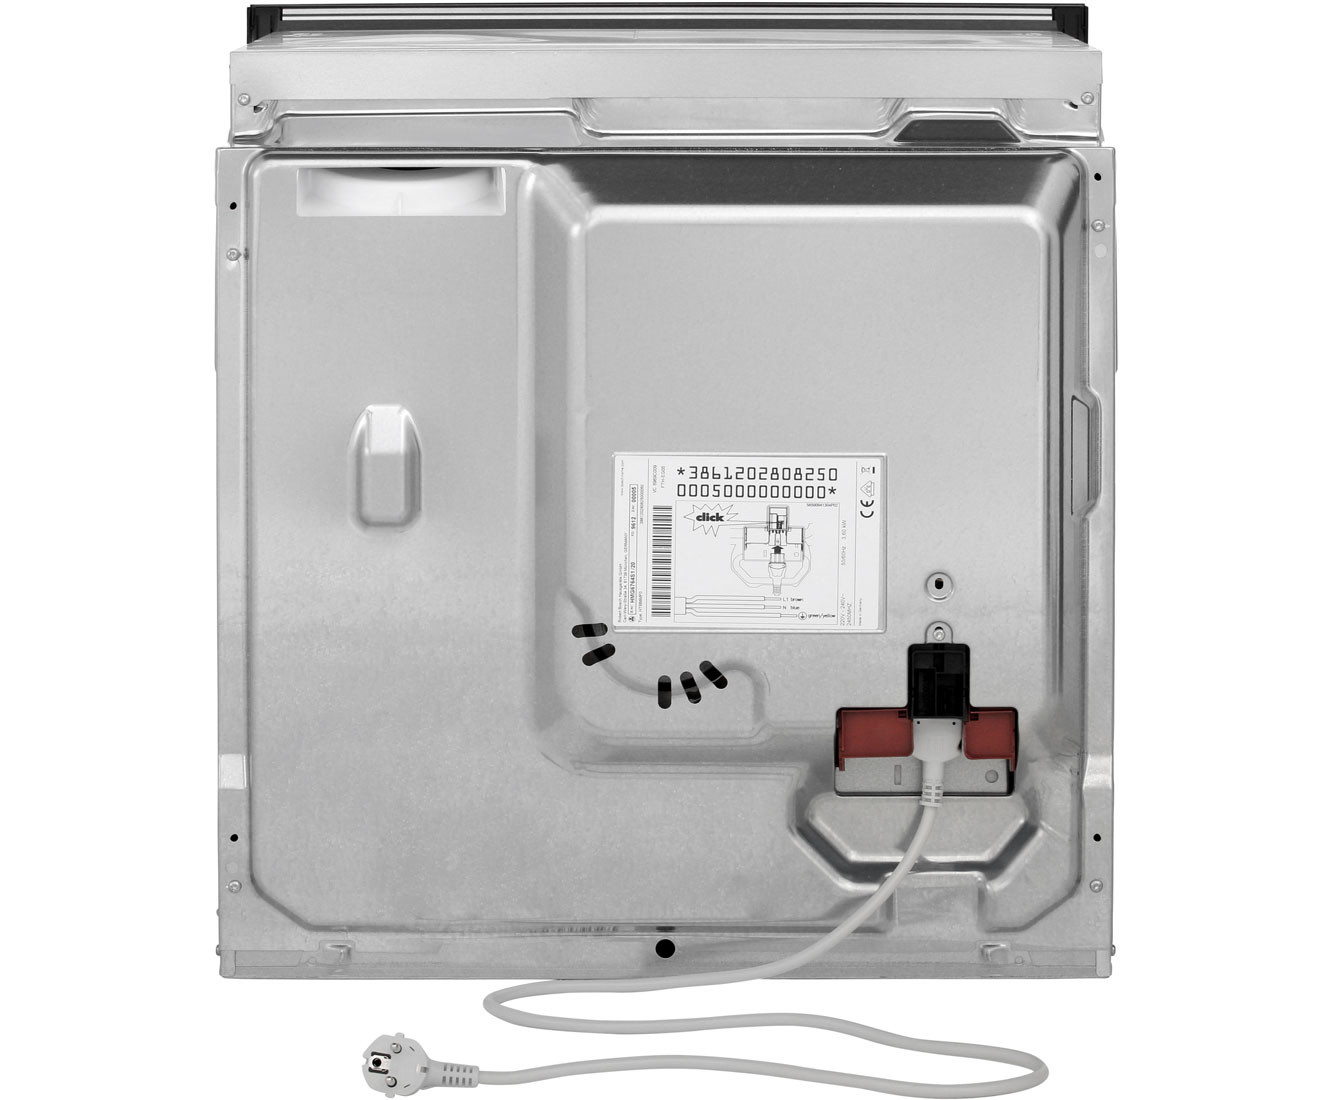 Bosch Serie 8 Hmg6764s1 Backofen Mit Mikrowellenfunktion Edelstahl